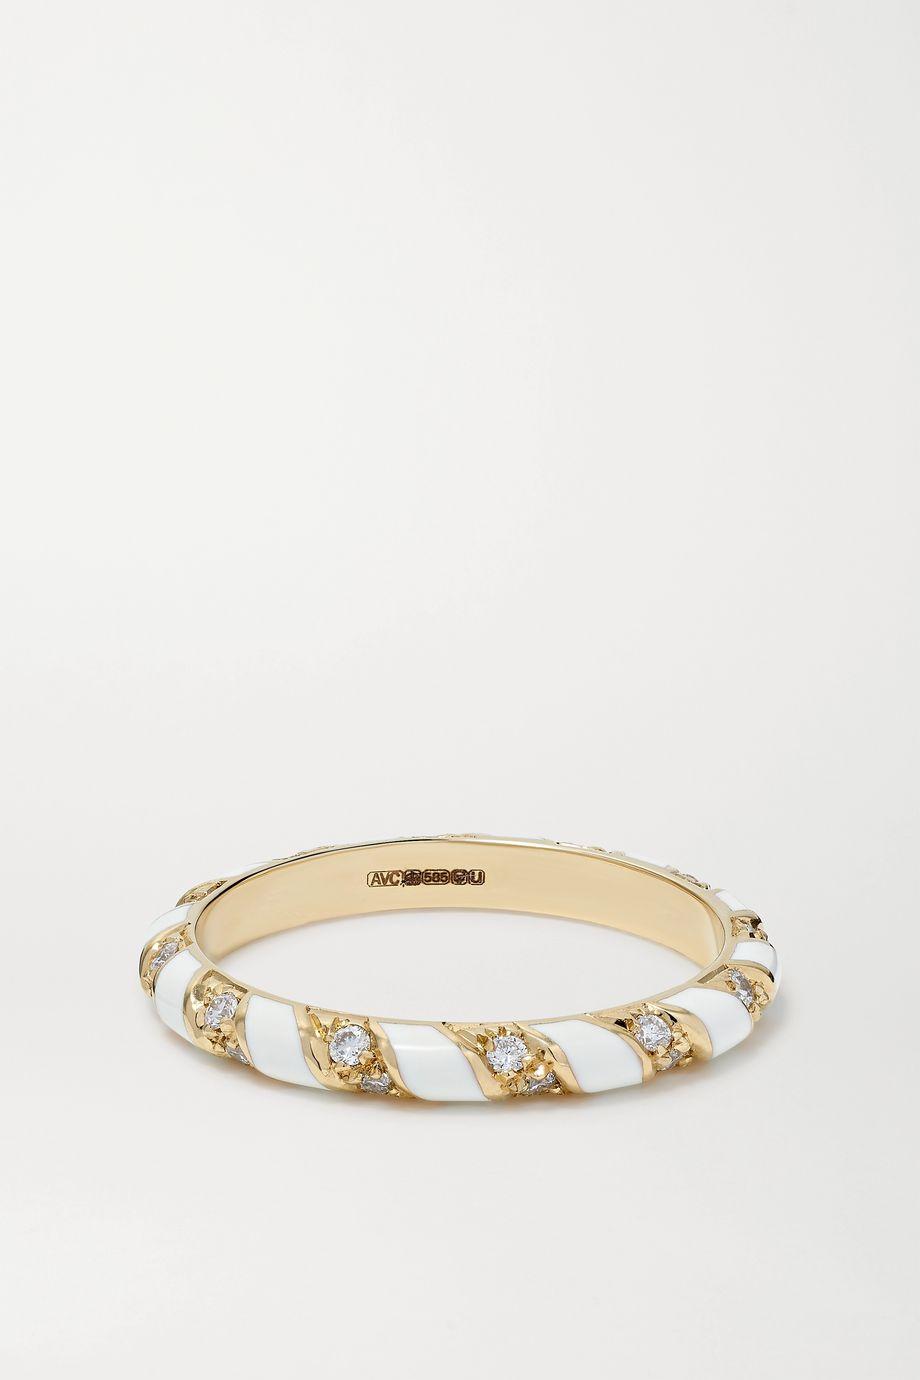 Alice Cicolini Candy 14-karat gold, enamel and diamond ring